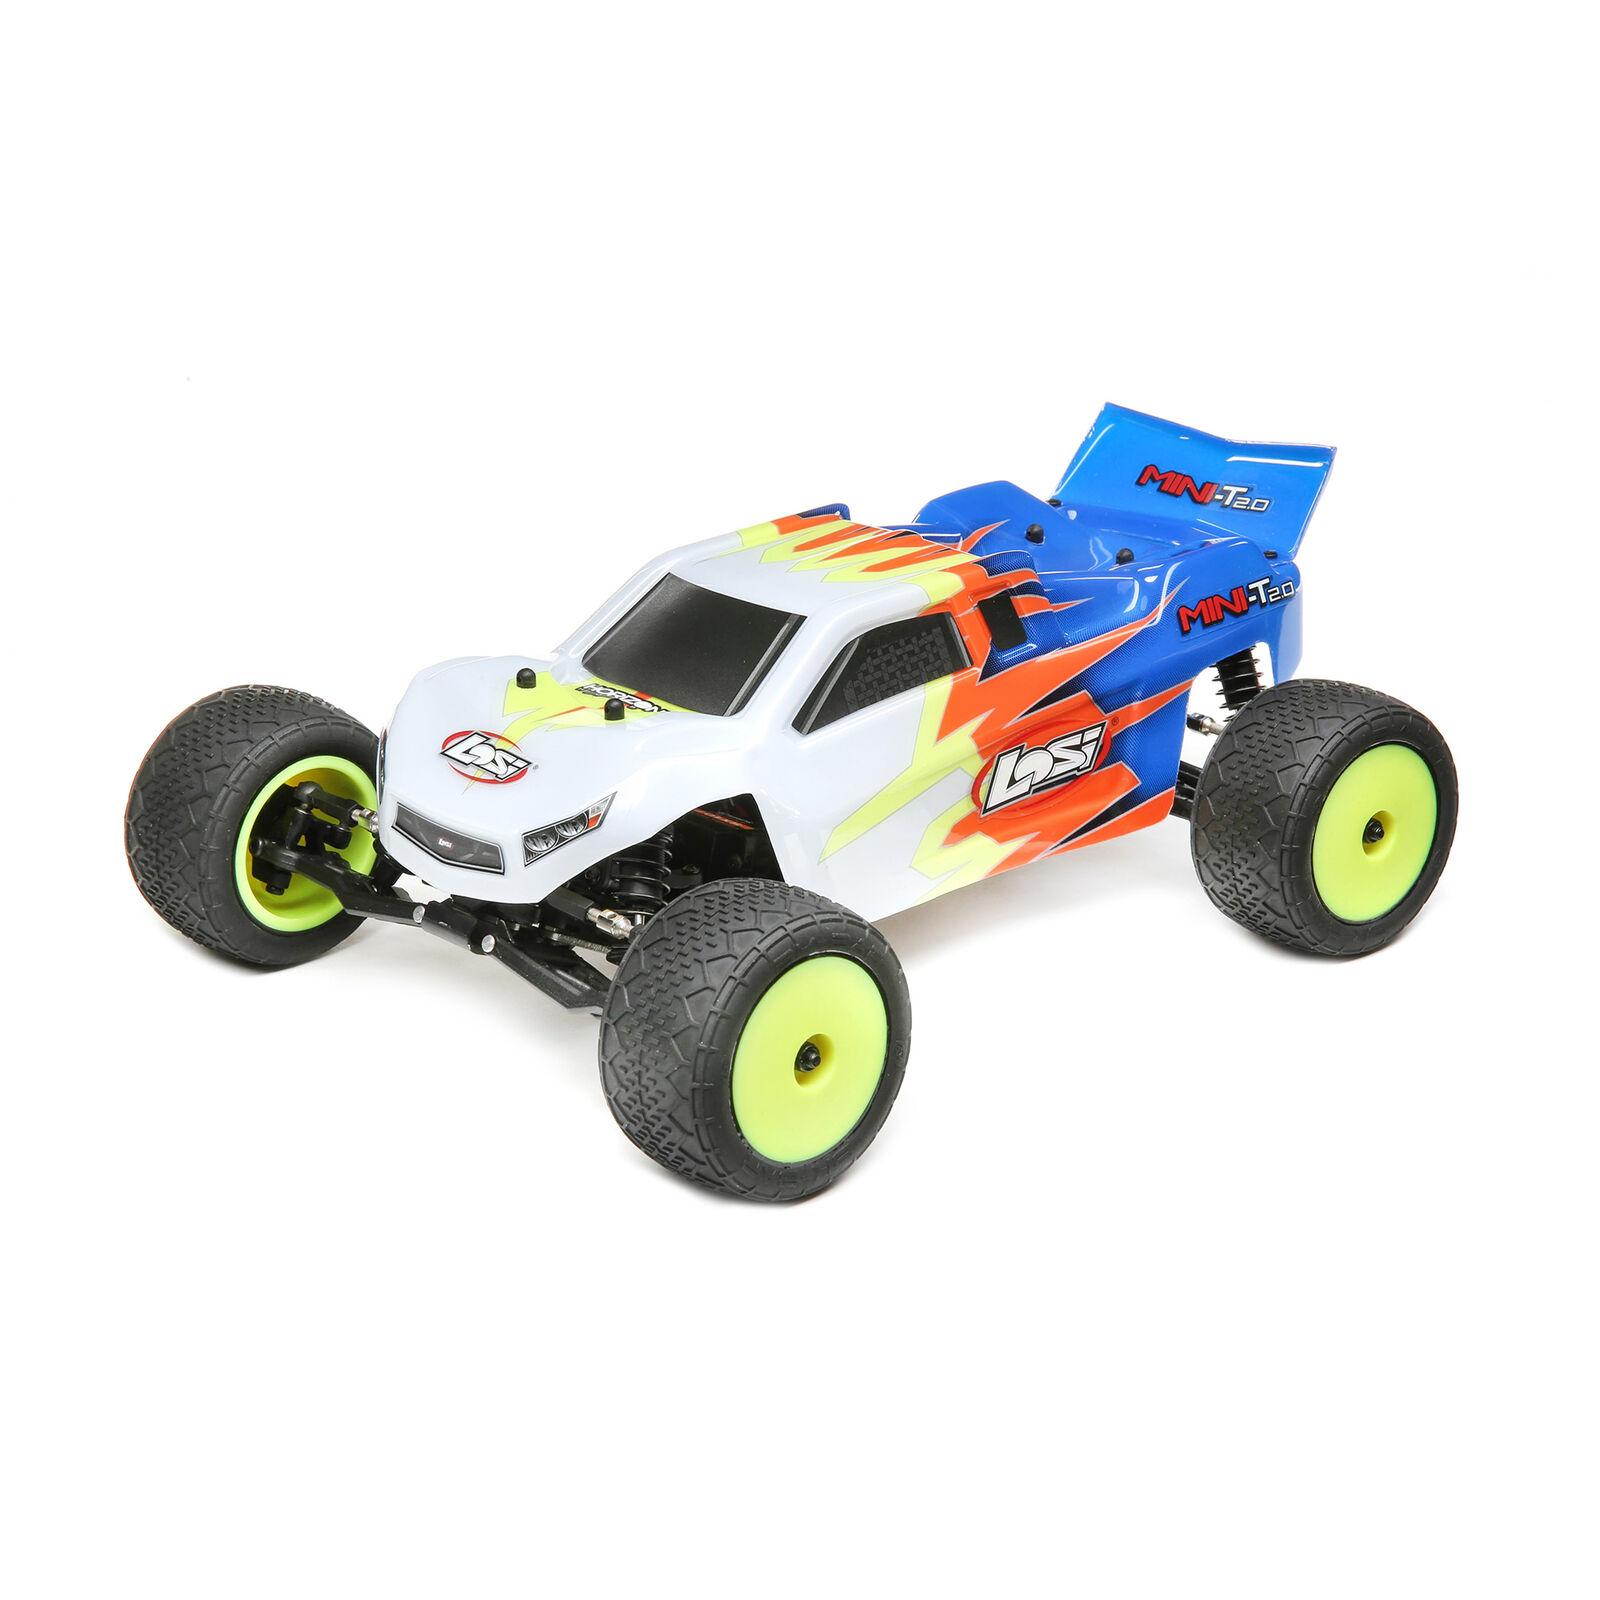 1/18 Mini-T 2.0 2WD Stadium Truck Brushed RTR, Blue/White